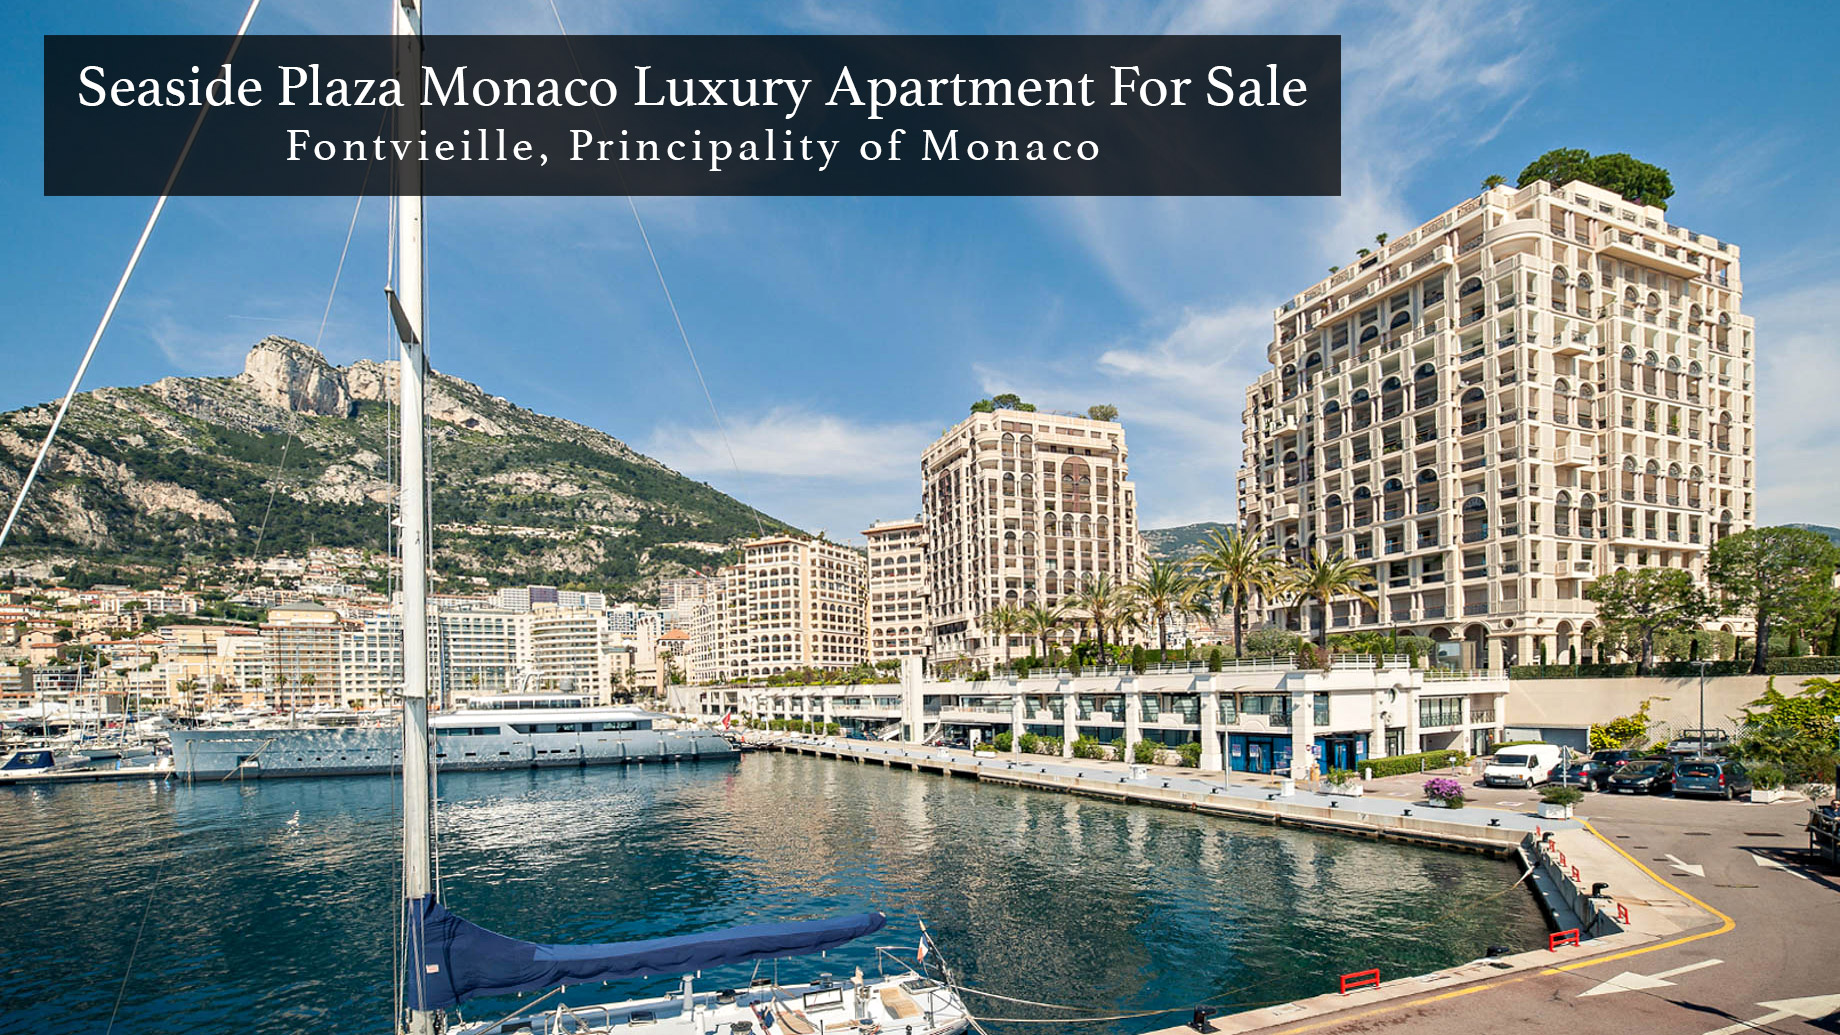 Seaside Plaza Monaco Luxury Apartment For Sale in Fontvieille, Principality of Monaco